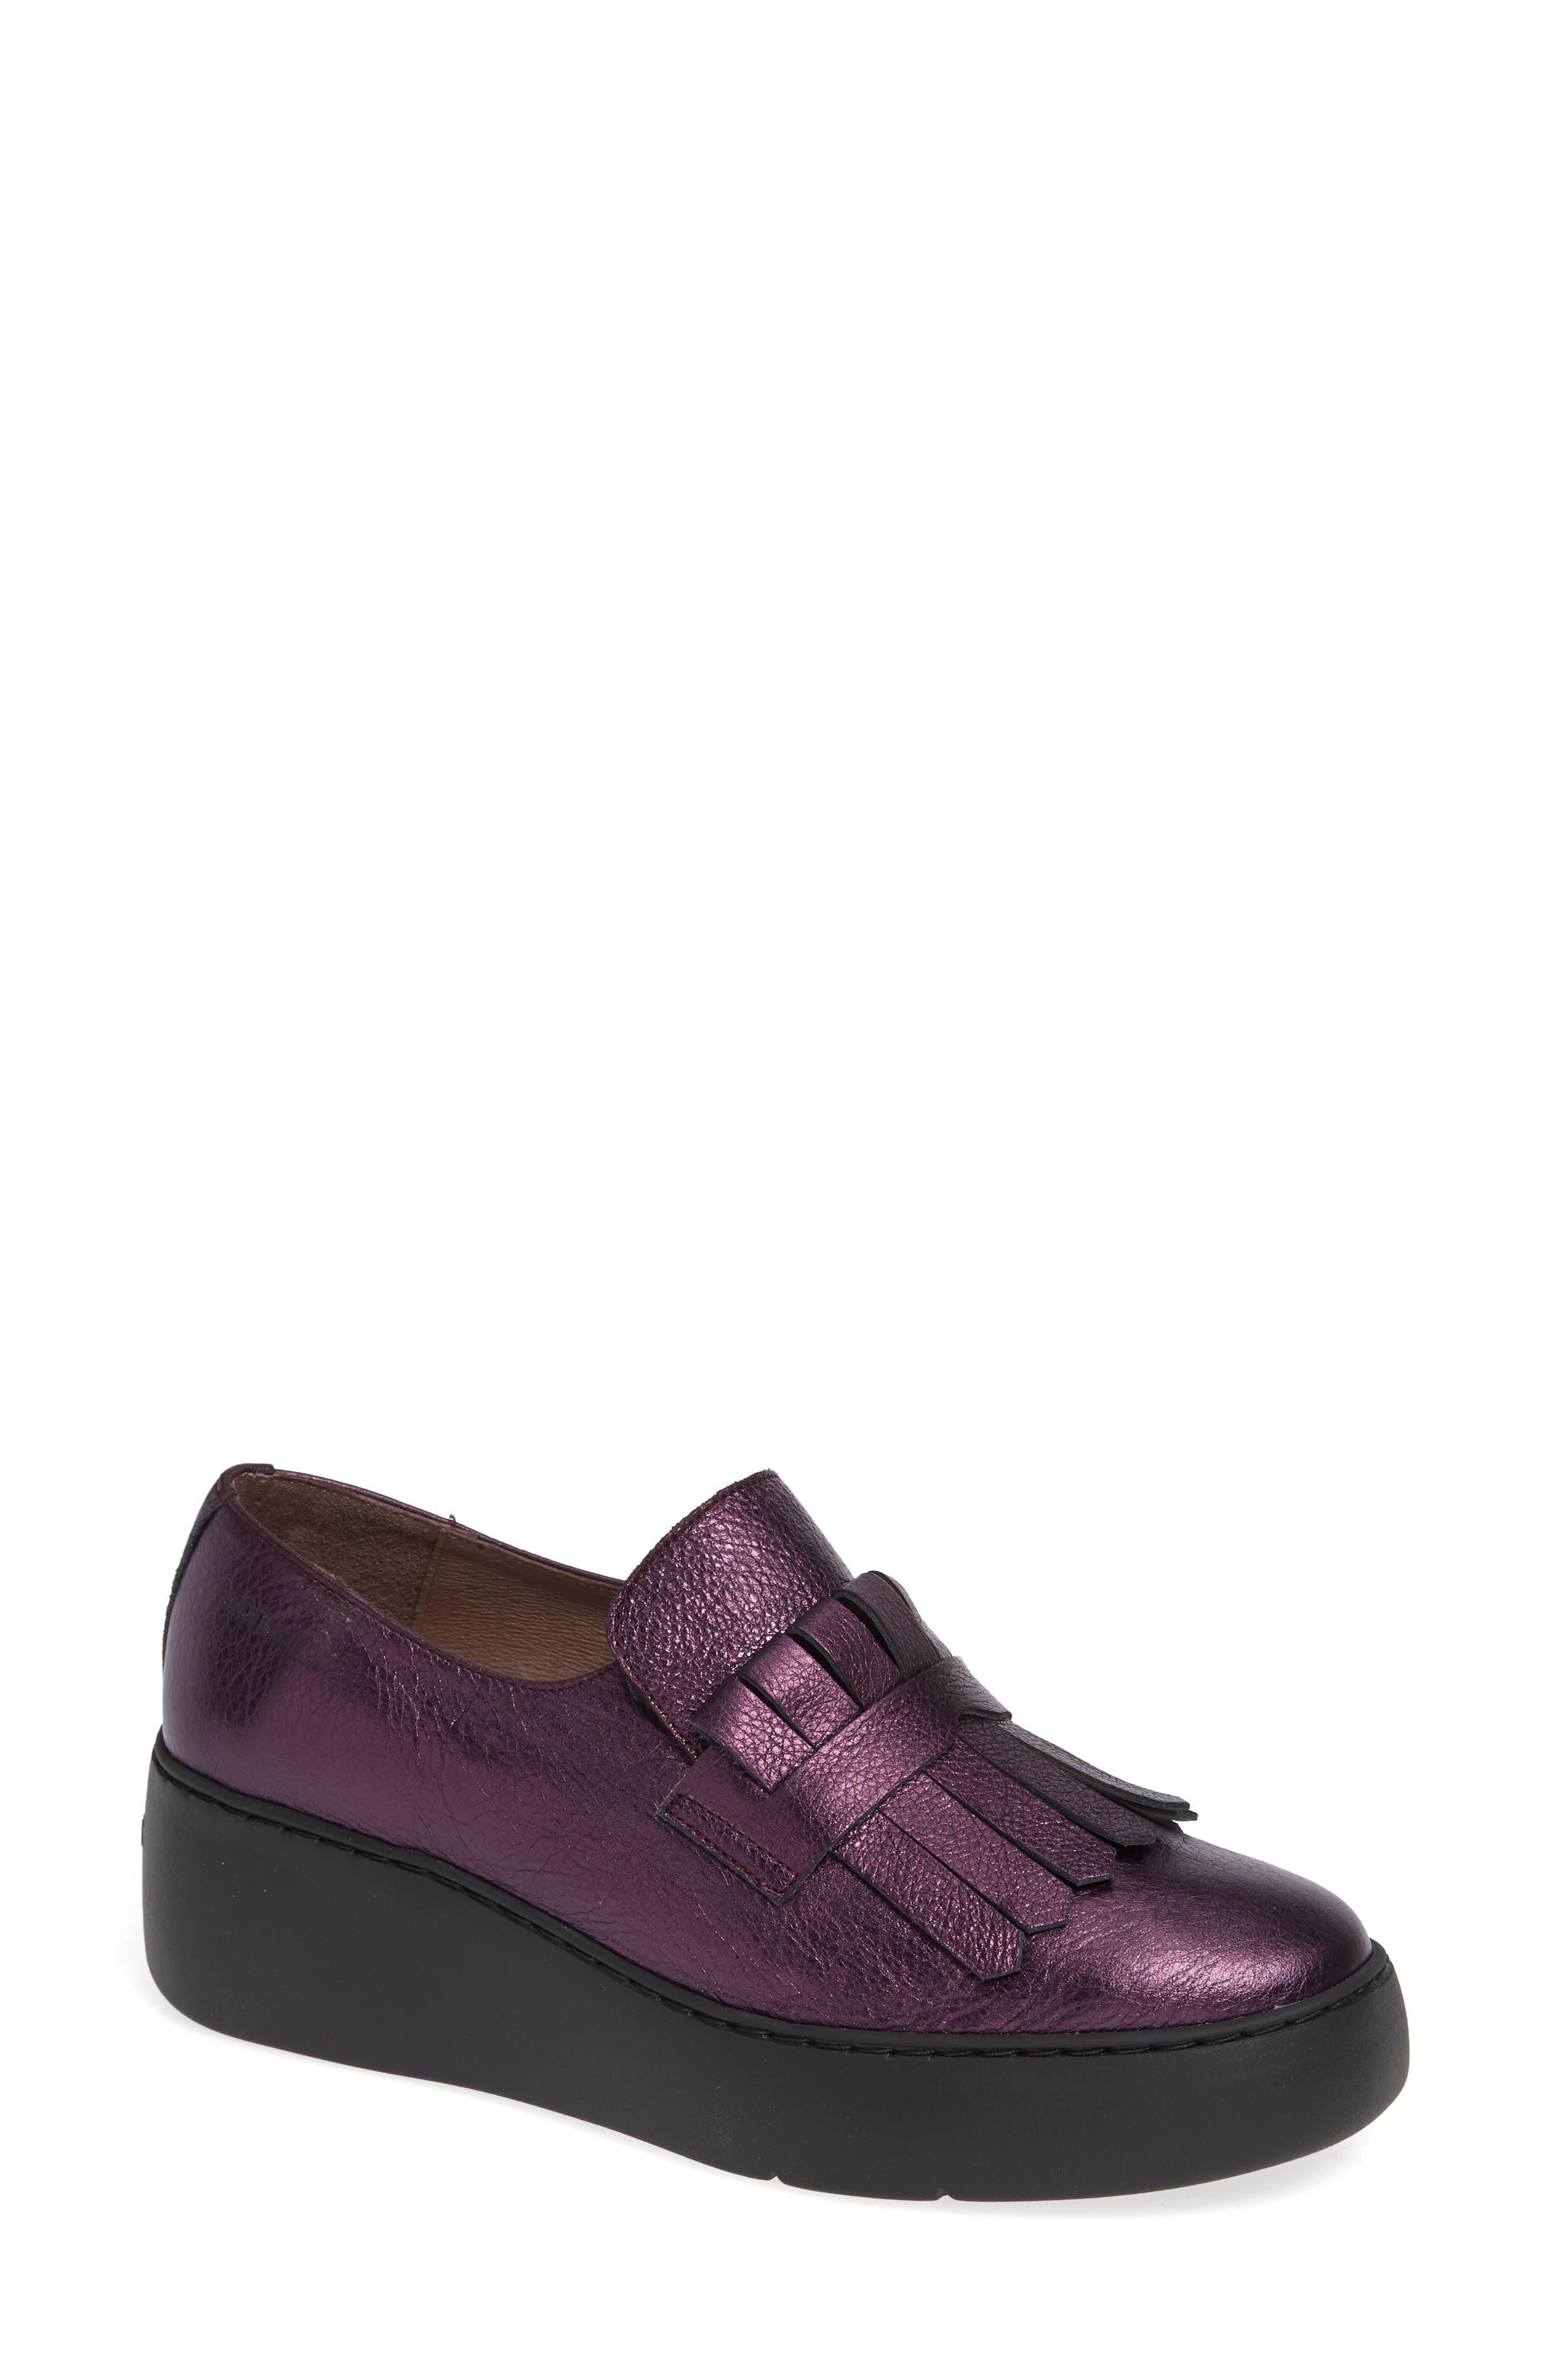 Wonders Kiltie Platform Loafer - Purple